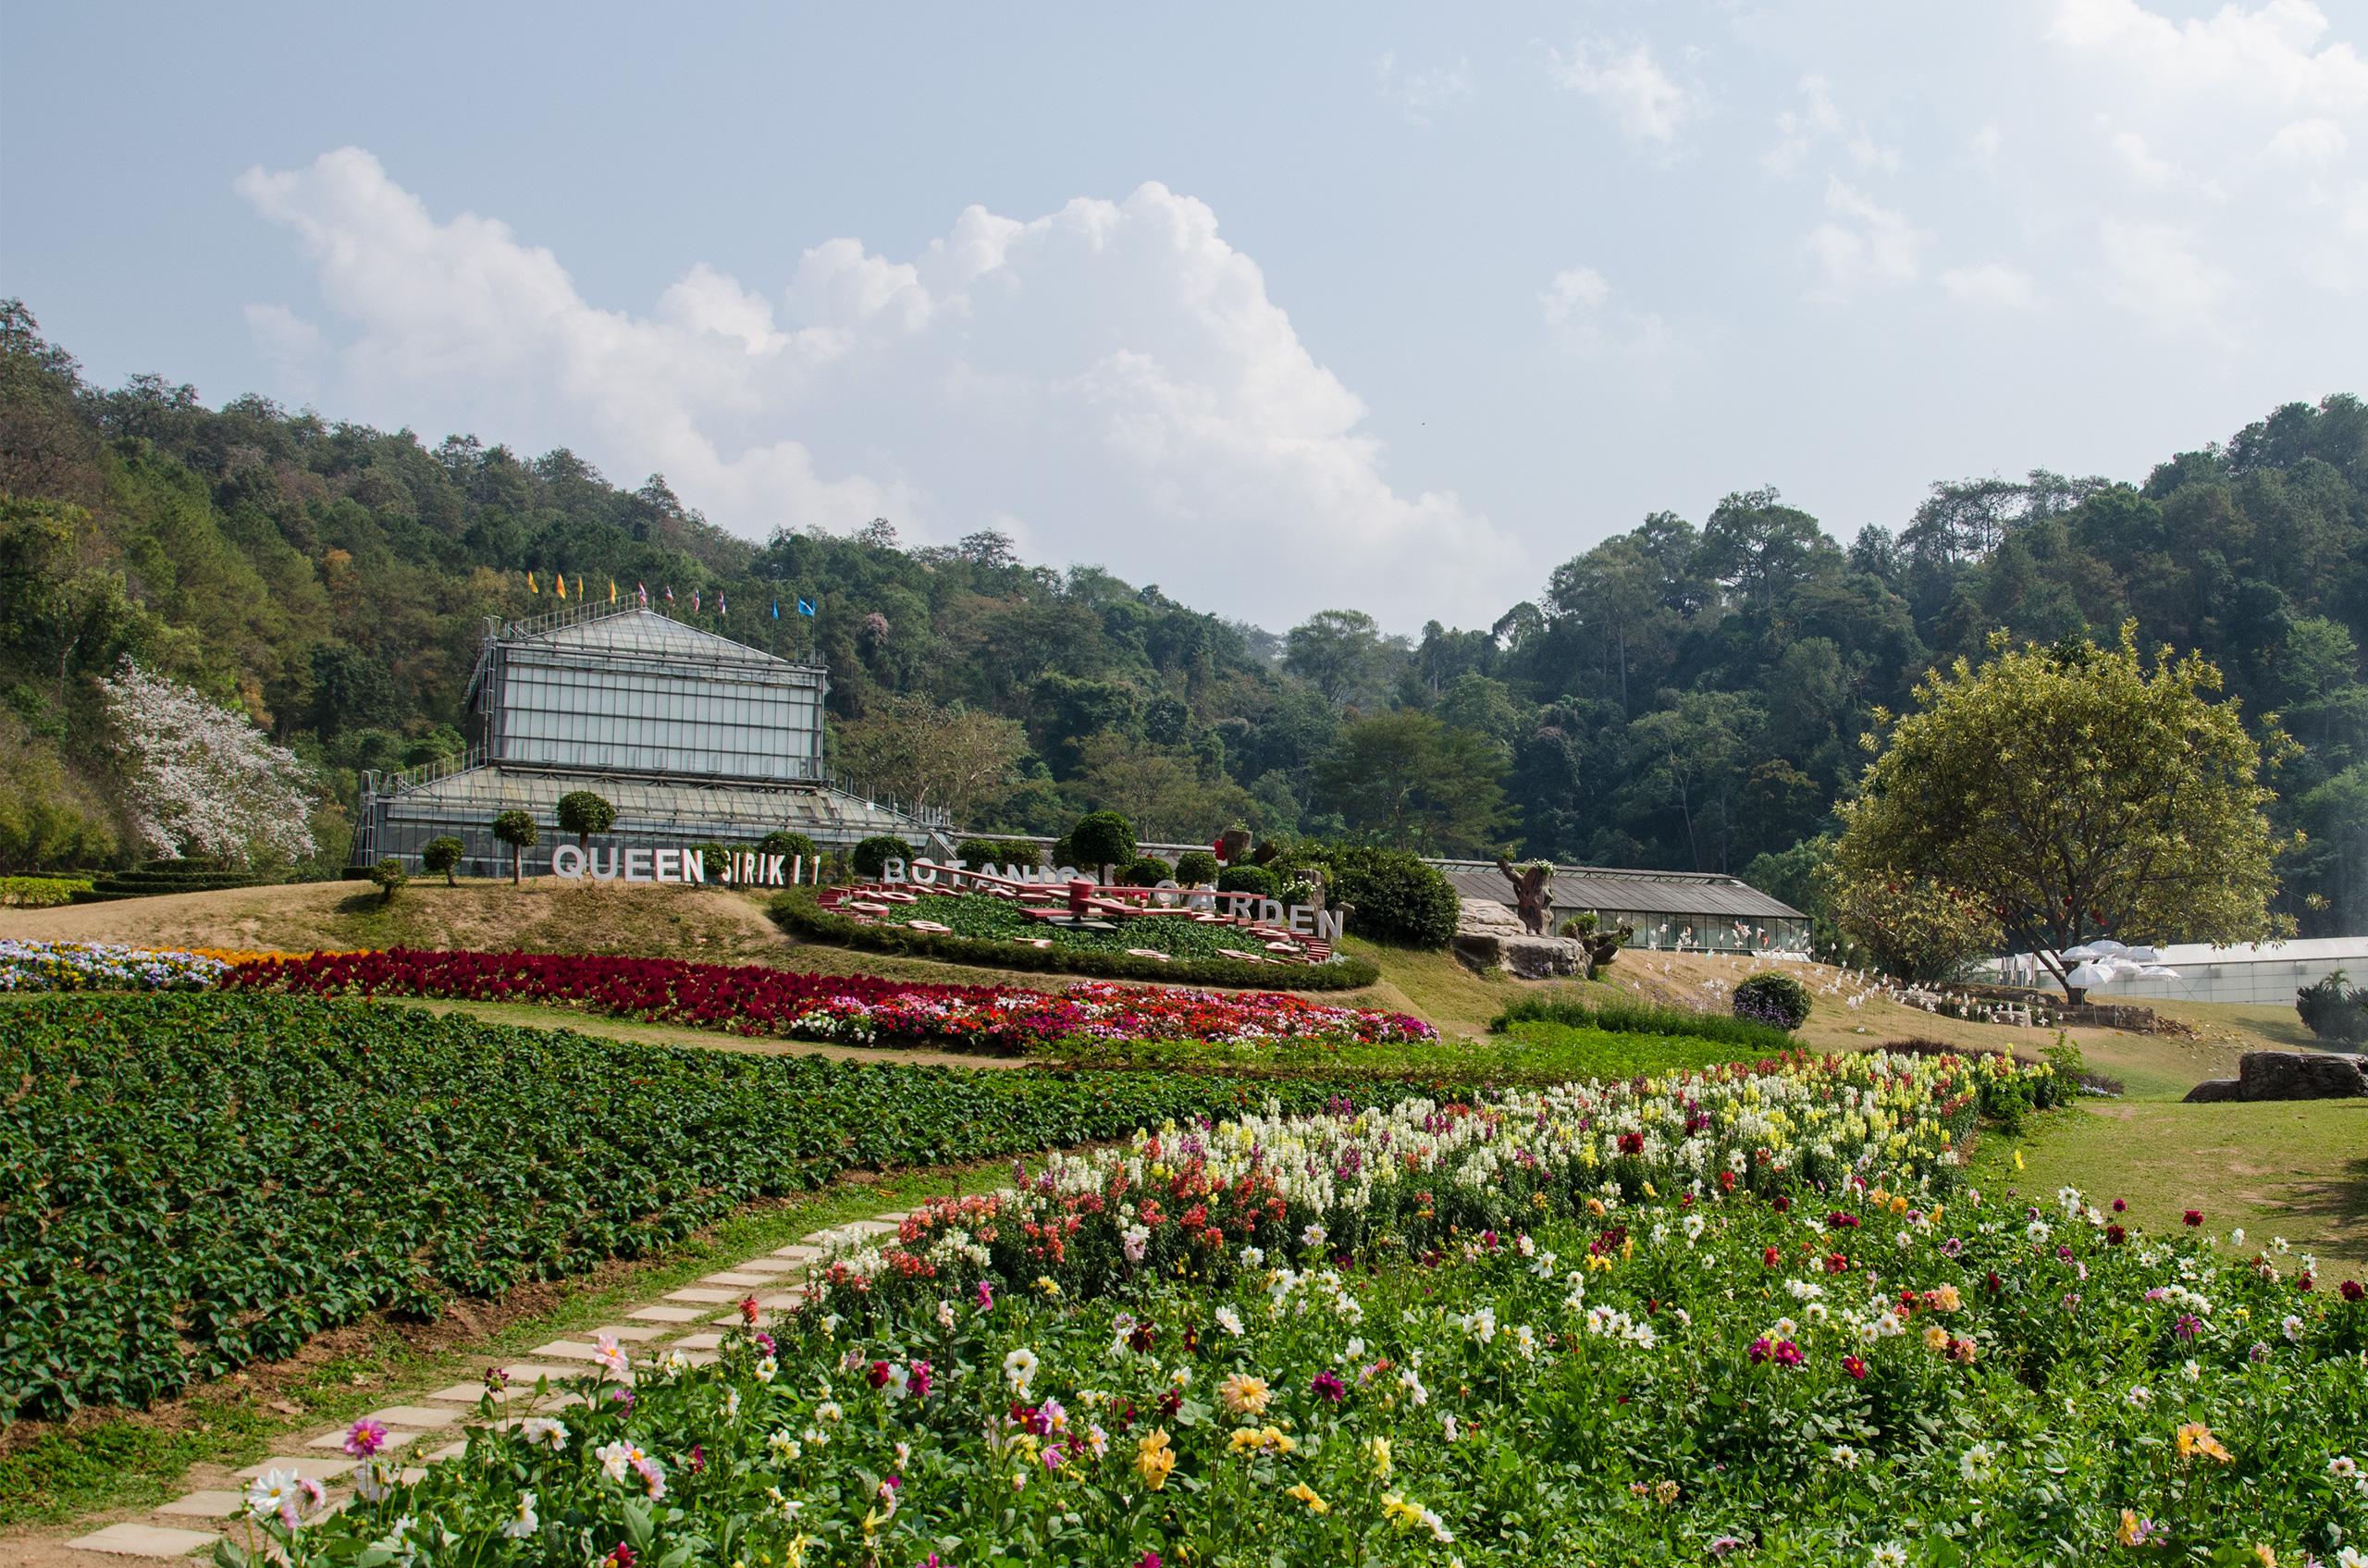 Queen Sirikit Botanic Garden Beautiful Flowers And Thailand S Longest Canopy Walkway The Blond Travels